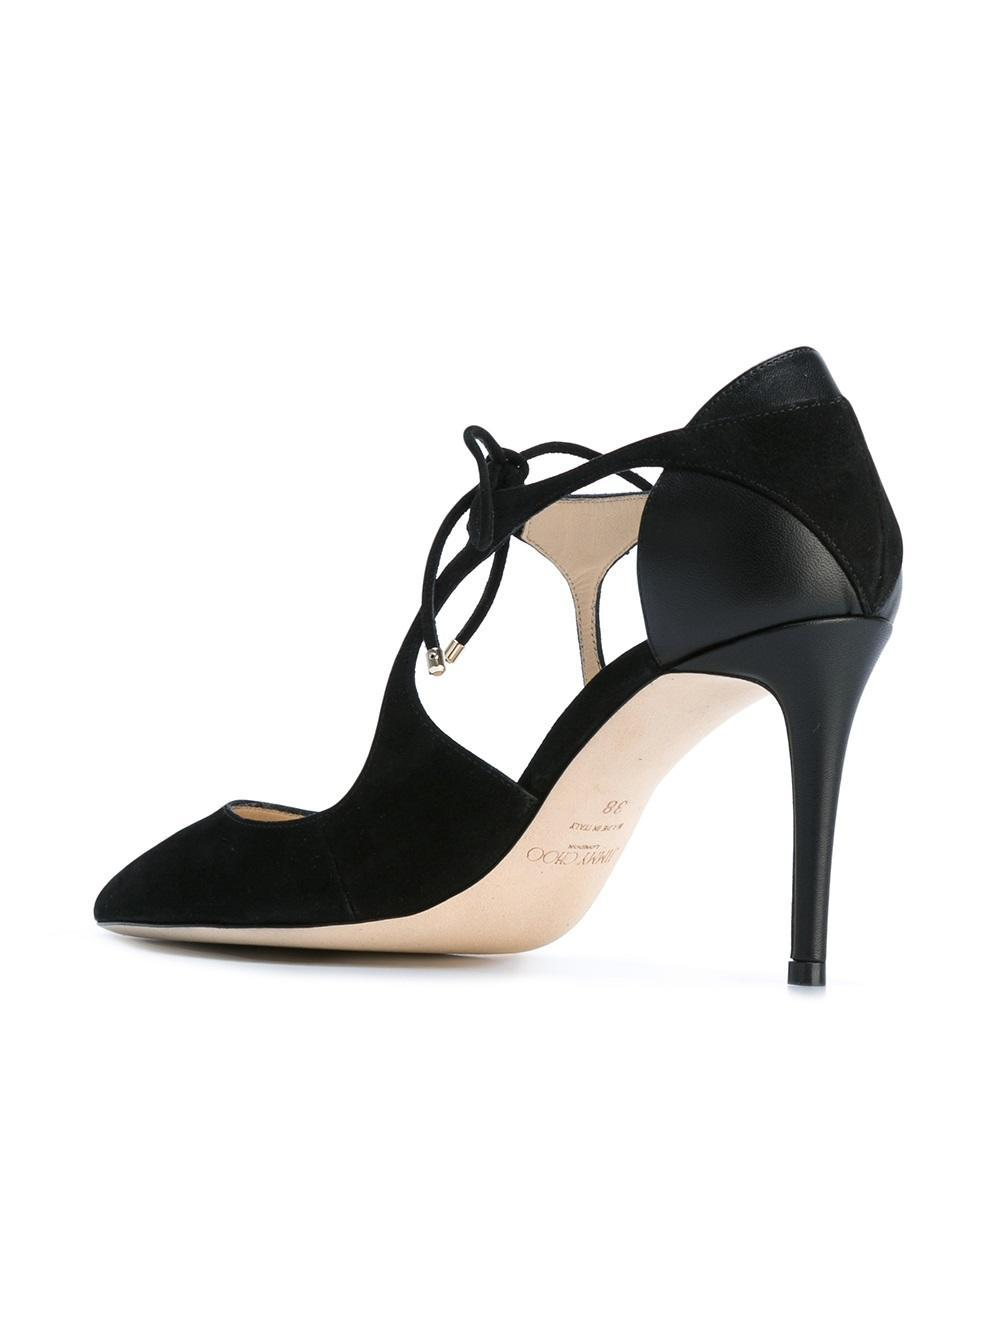 Jimmy choo Mesh & Leather Vanessa 85 Heels C6IDH